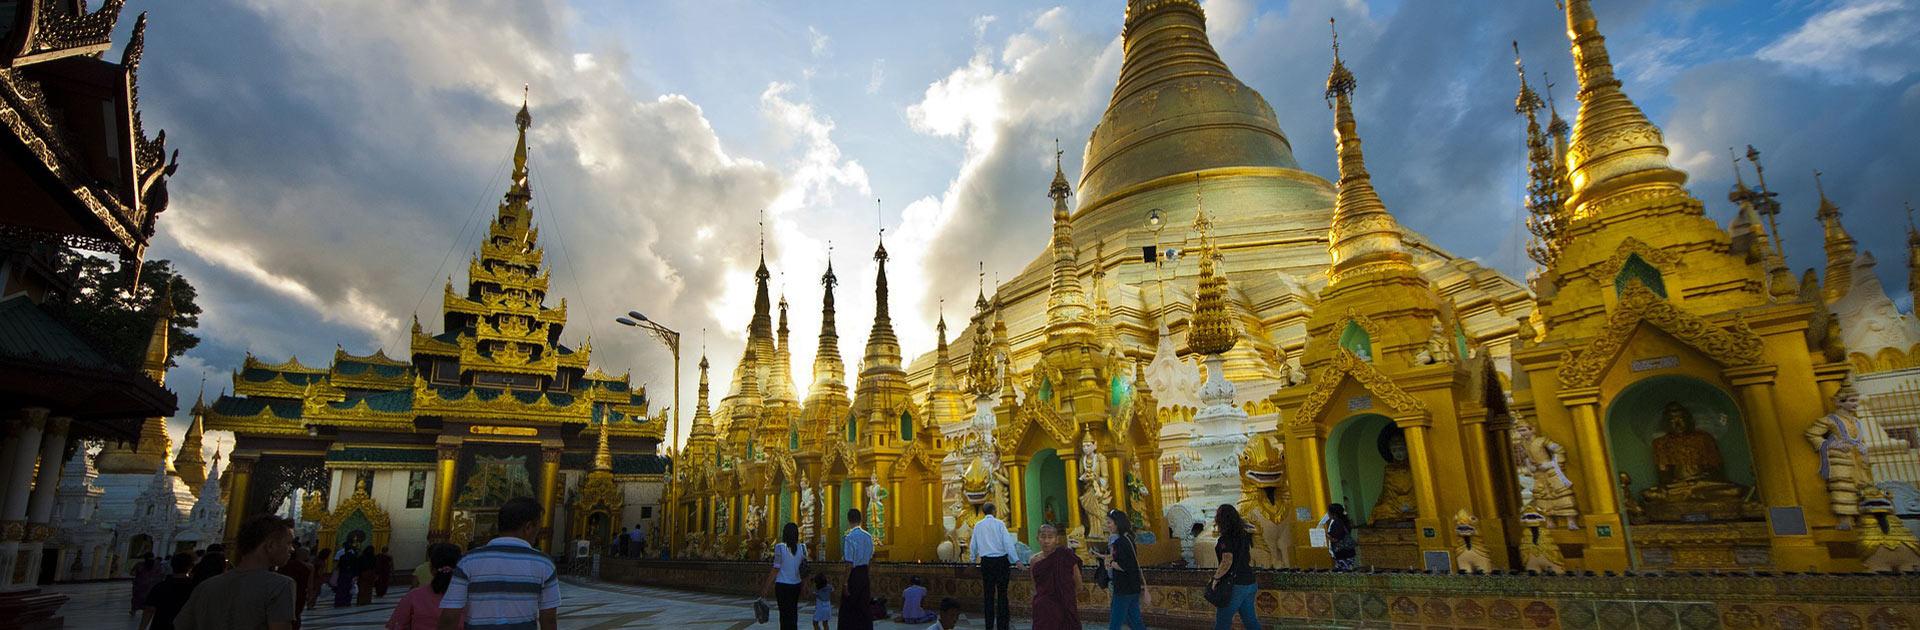 MM Tradición de Myanmar 13 días 1 1